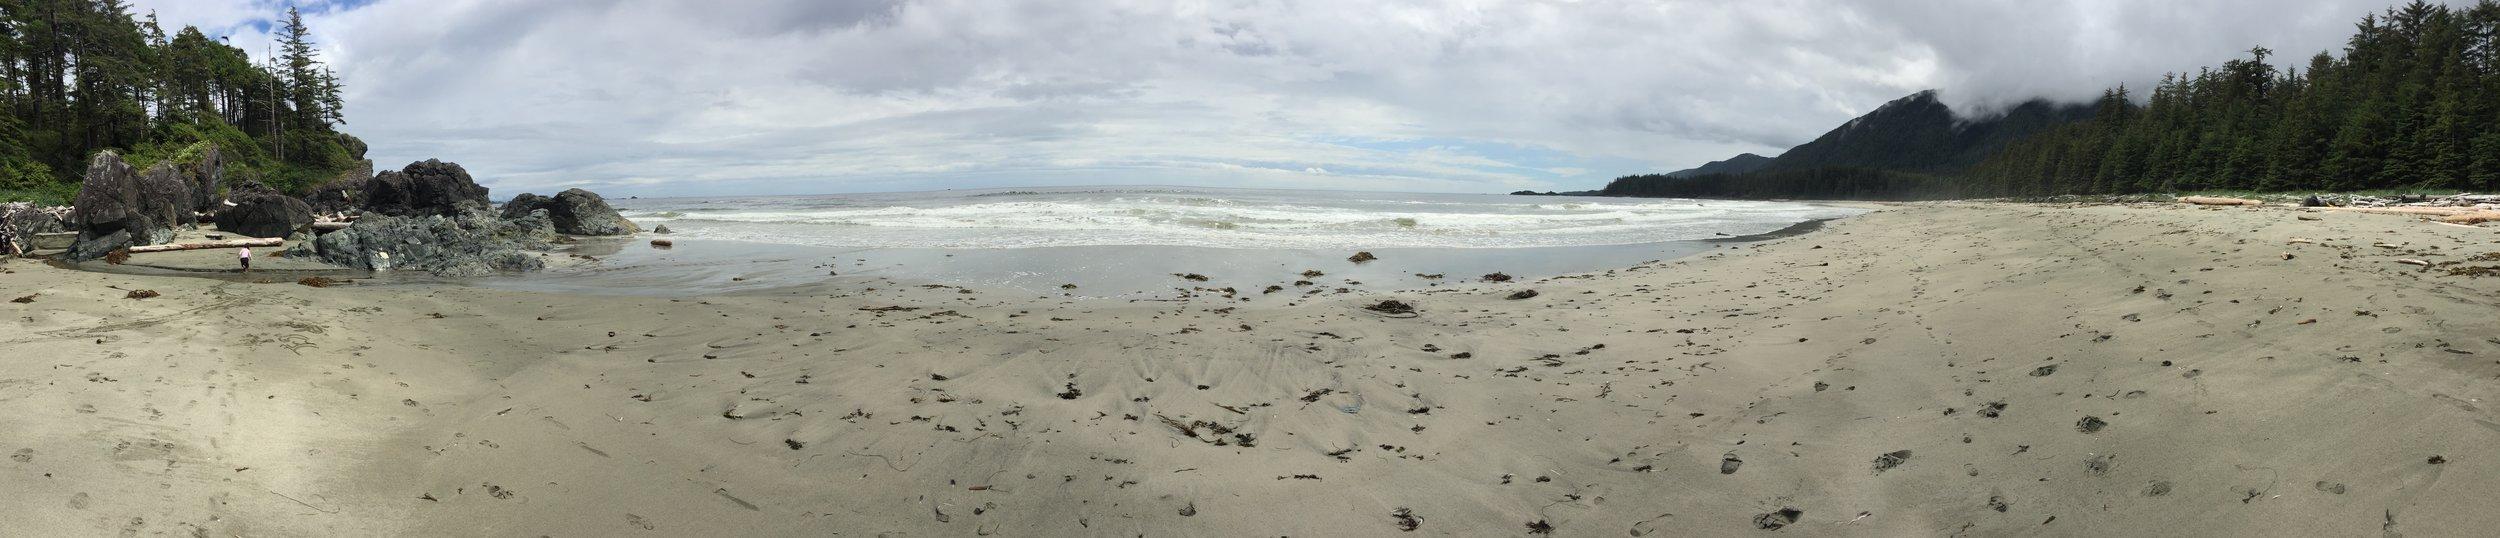 Brooks Peninsula: Desolate beach